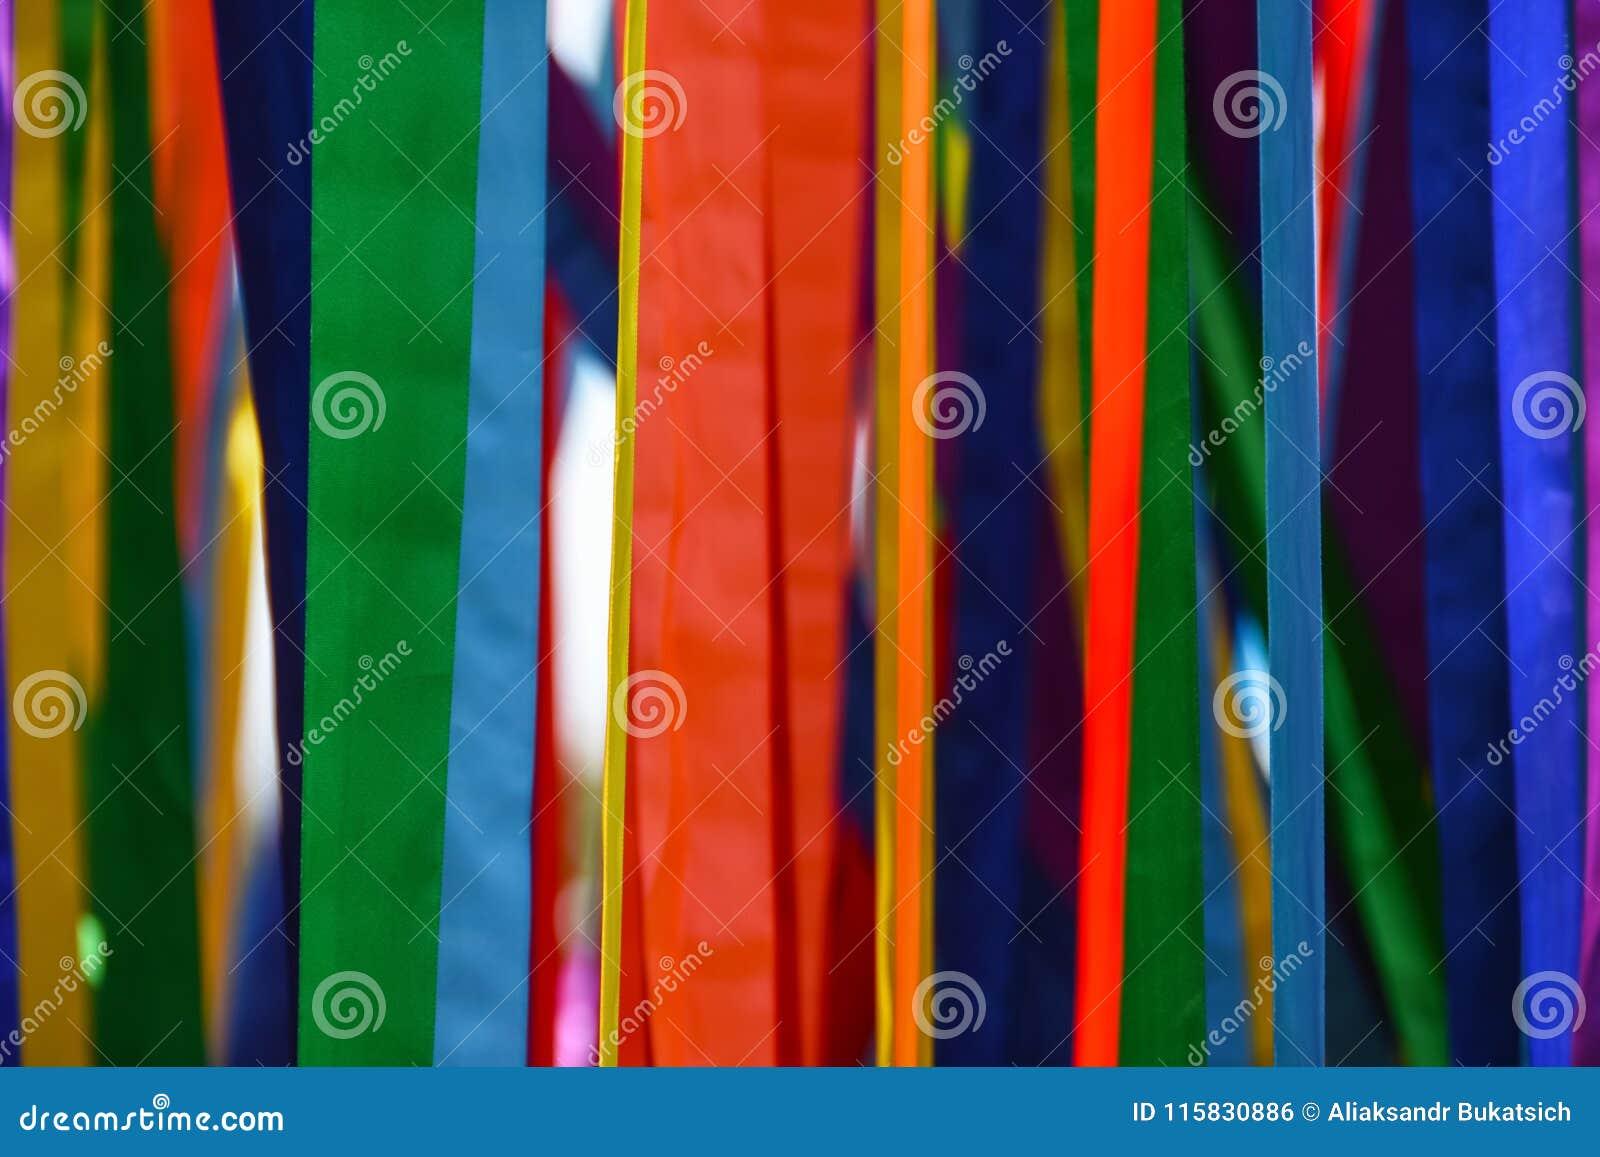 Покрасьте ленты, концепцию LGBT, свободу, Европу, гомосексуалистов, парад, предпосылку, космос экземпляра, флаг